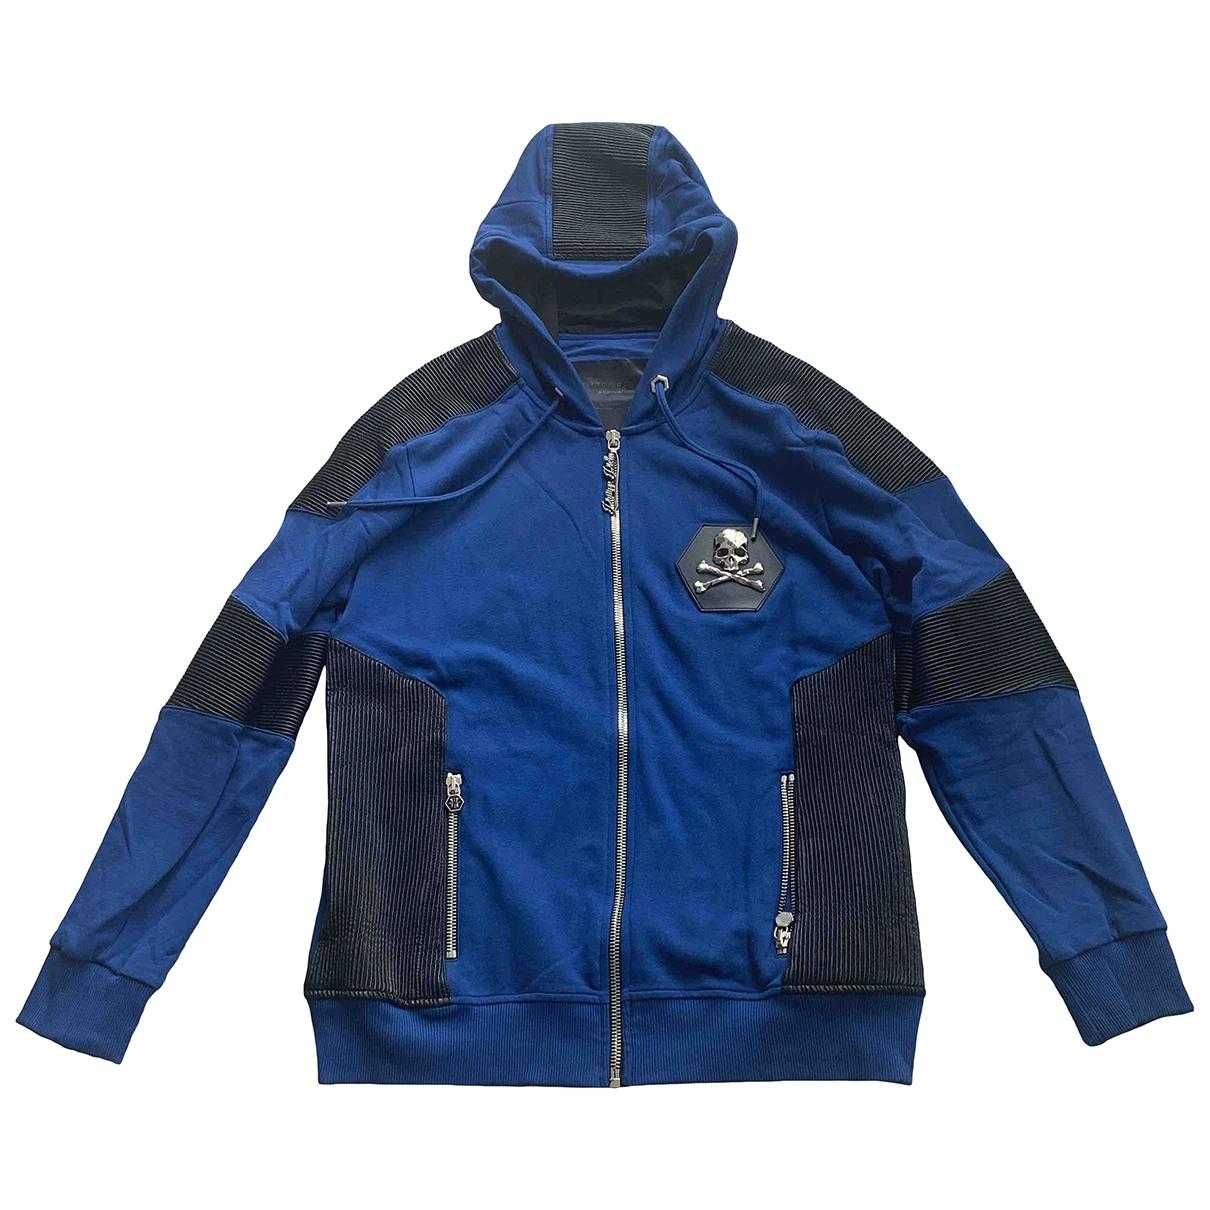 Philipp Plein \N Blue Cotton Knitwear & Sweatshirts for Men 5 0 - 6